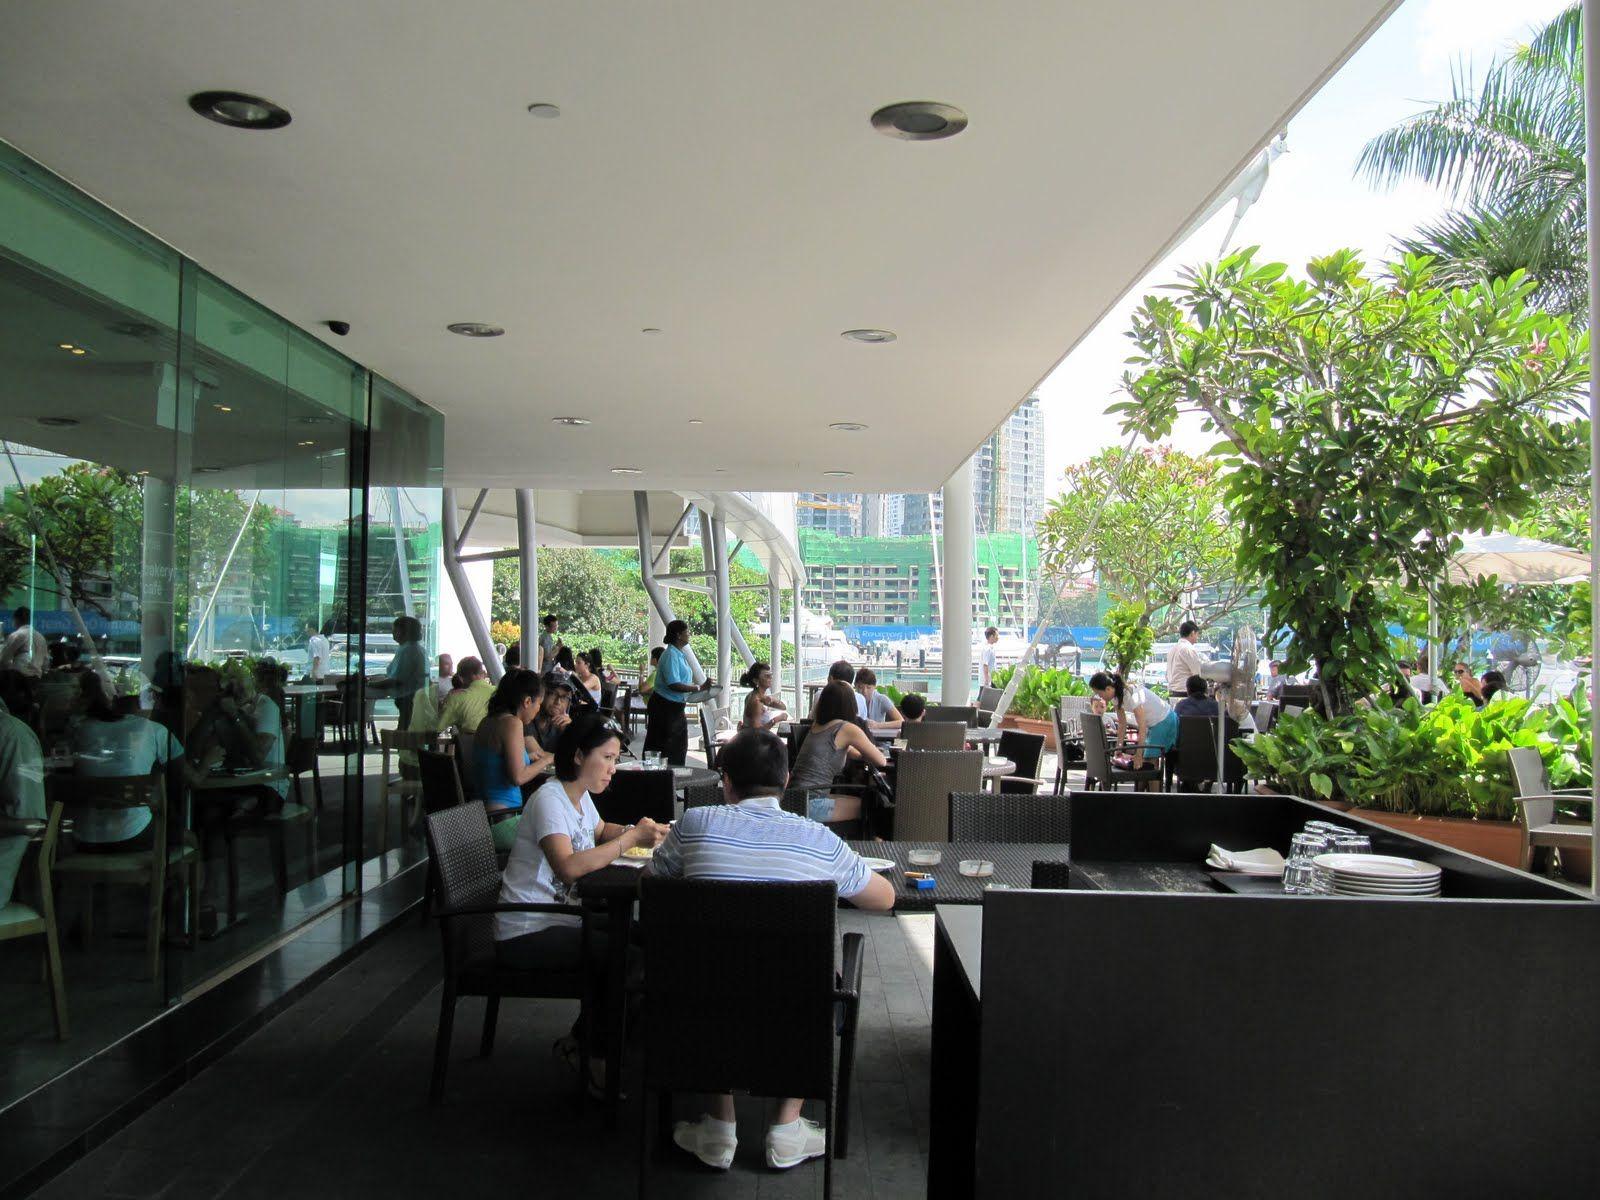 Prive Bakery Cafe Bakery Cafe Cafe Restaurant Bar